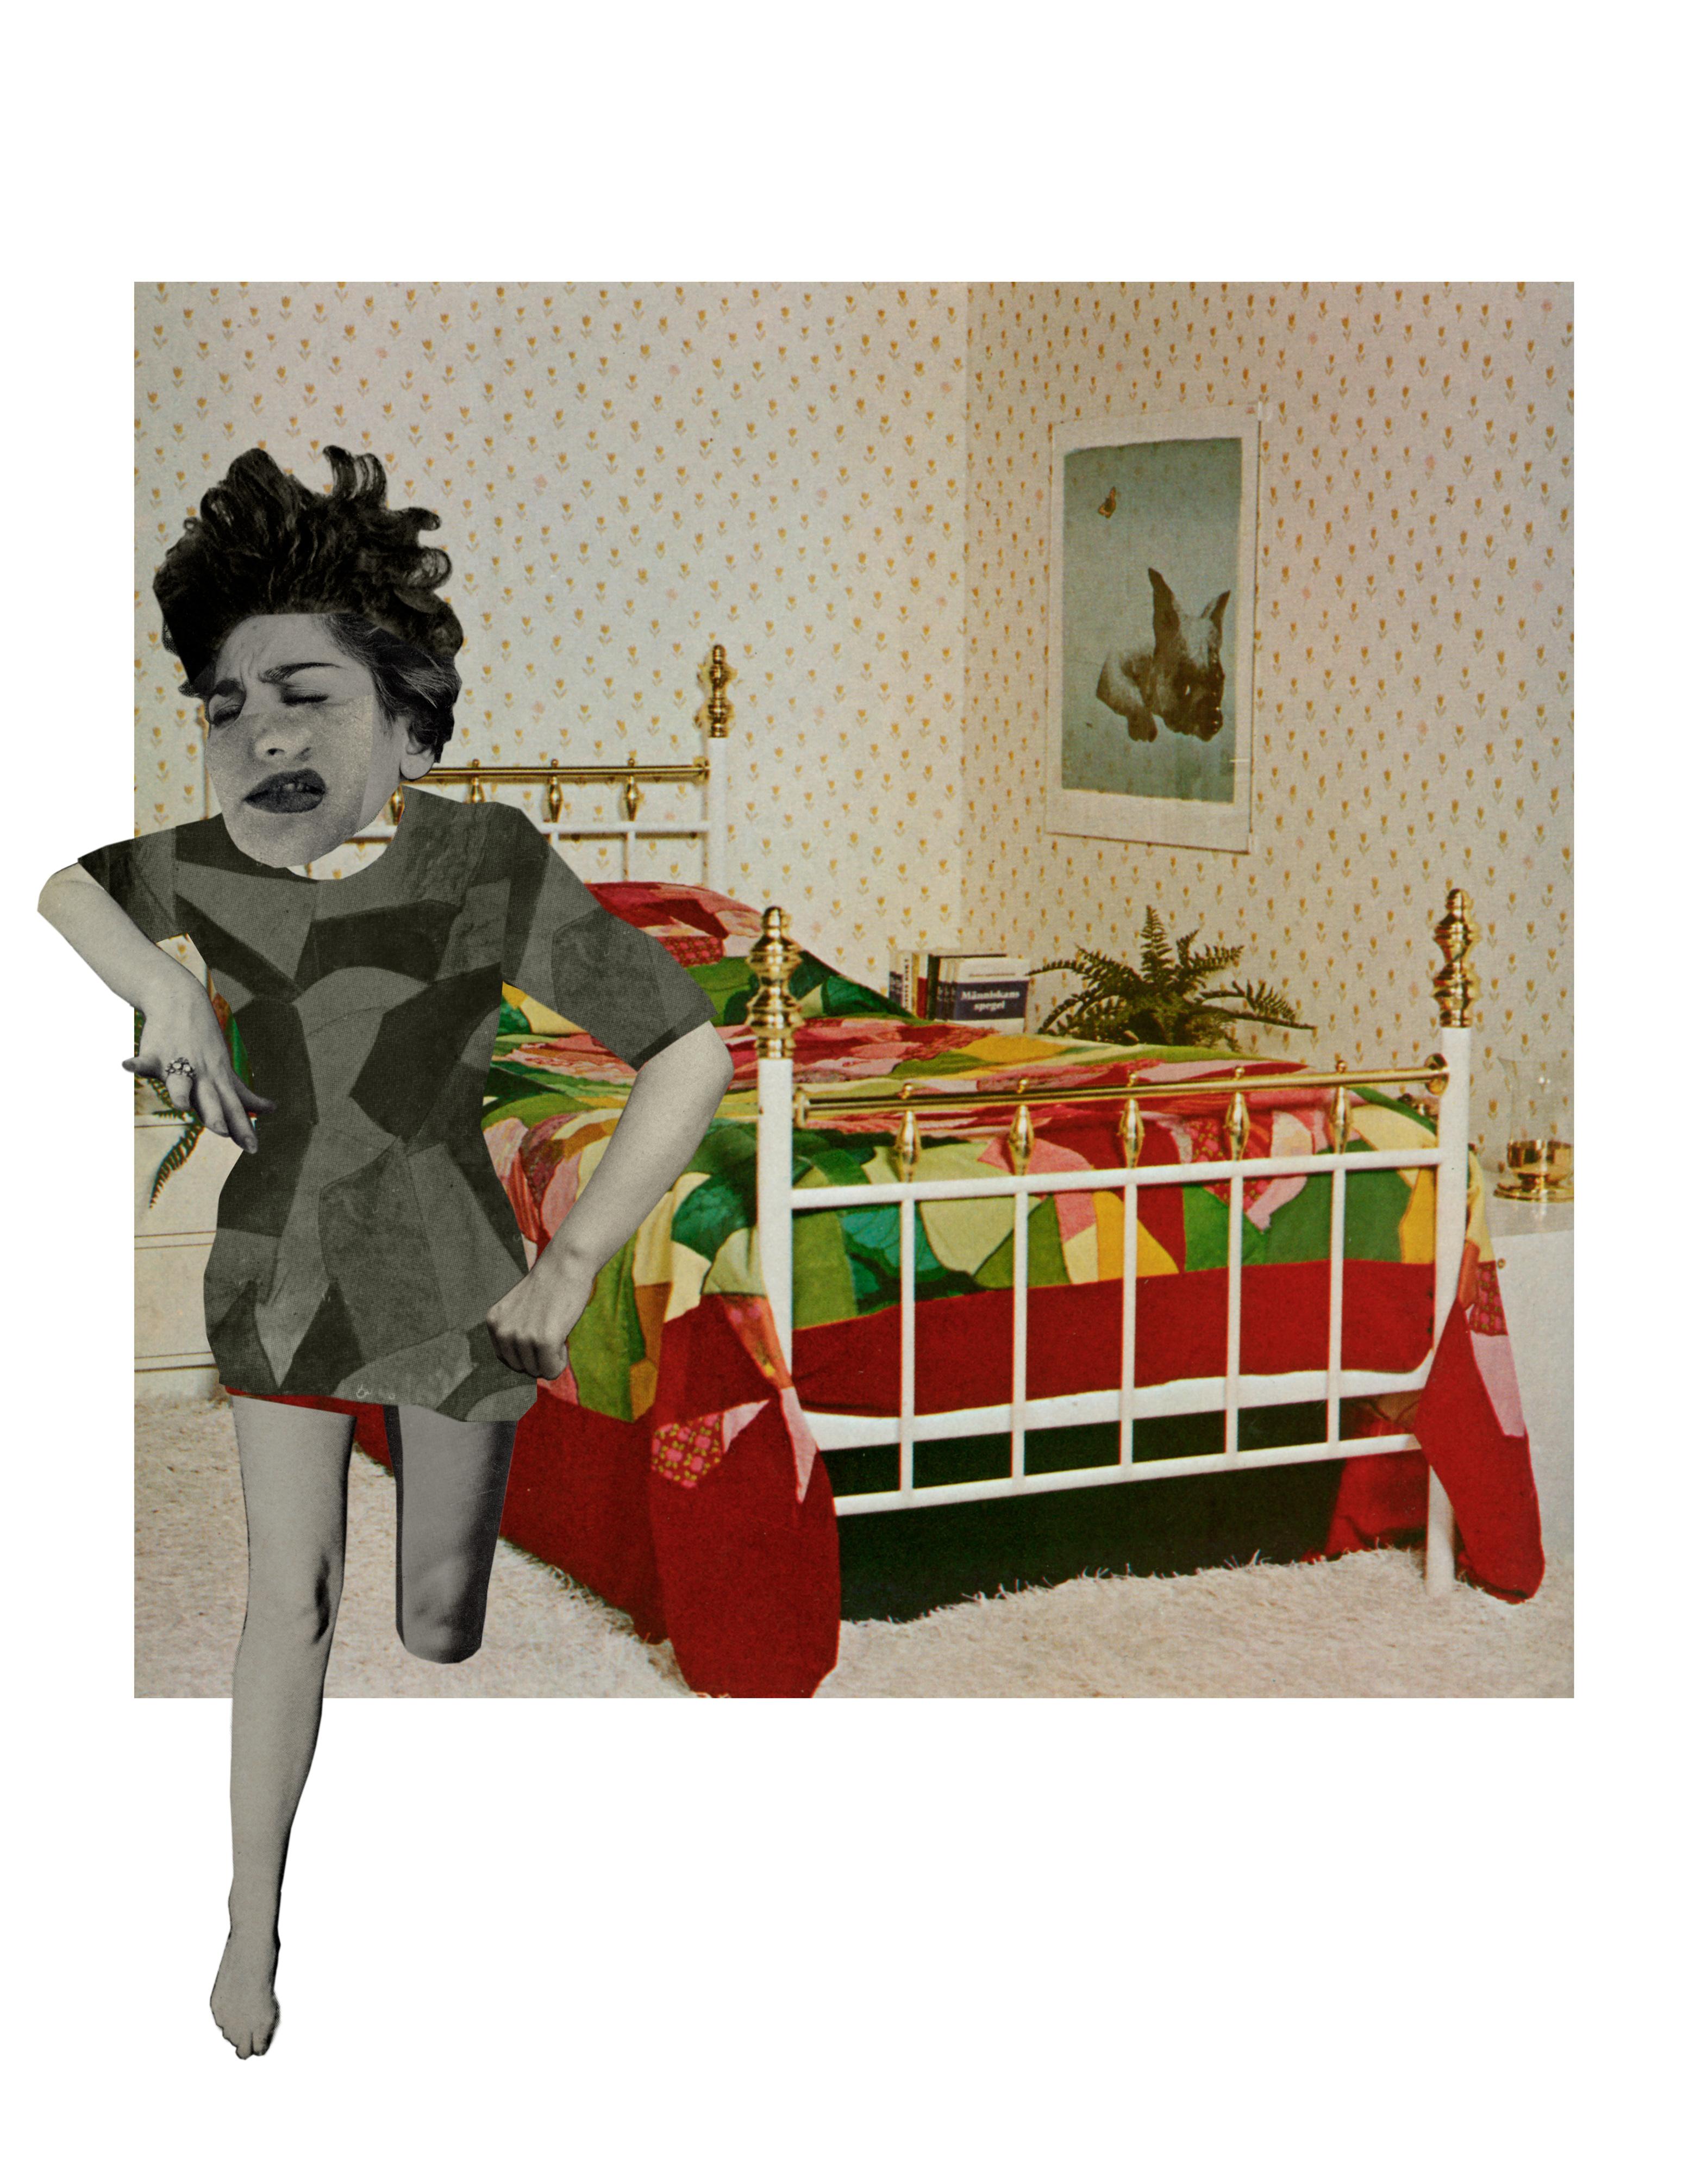 Galerie Barbara Thumm \ New Viewings #32 \ Eva Stenram